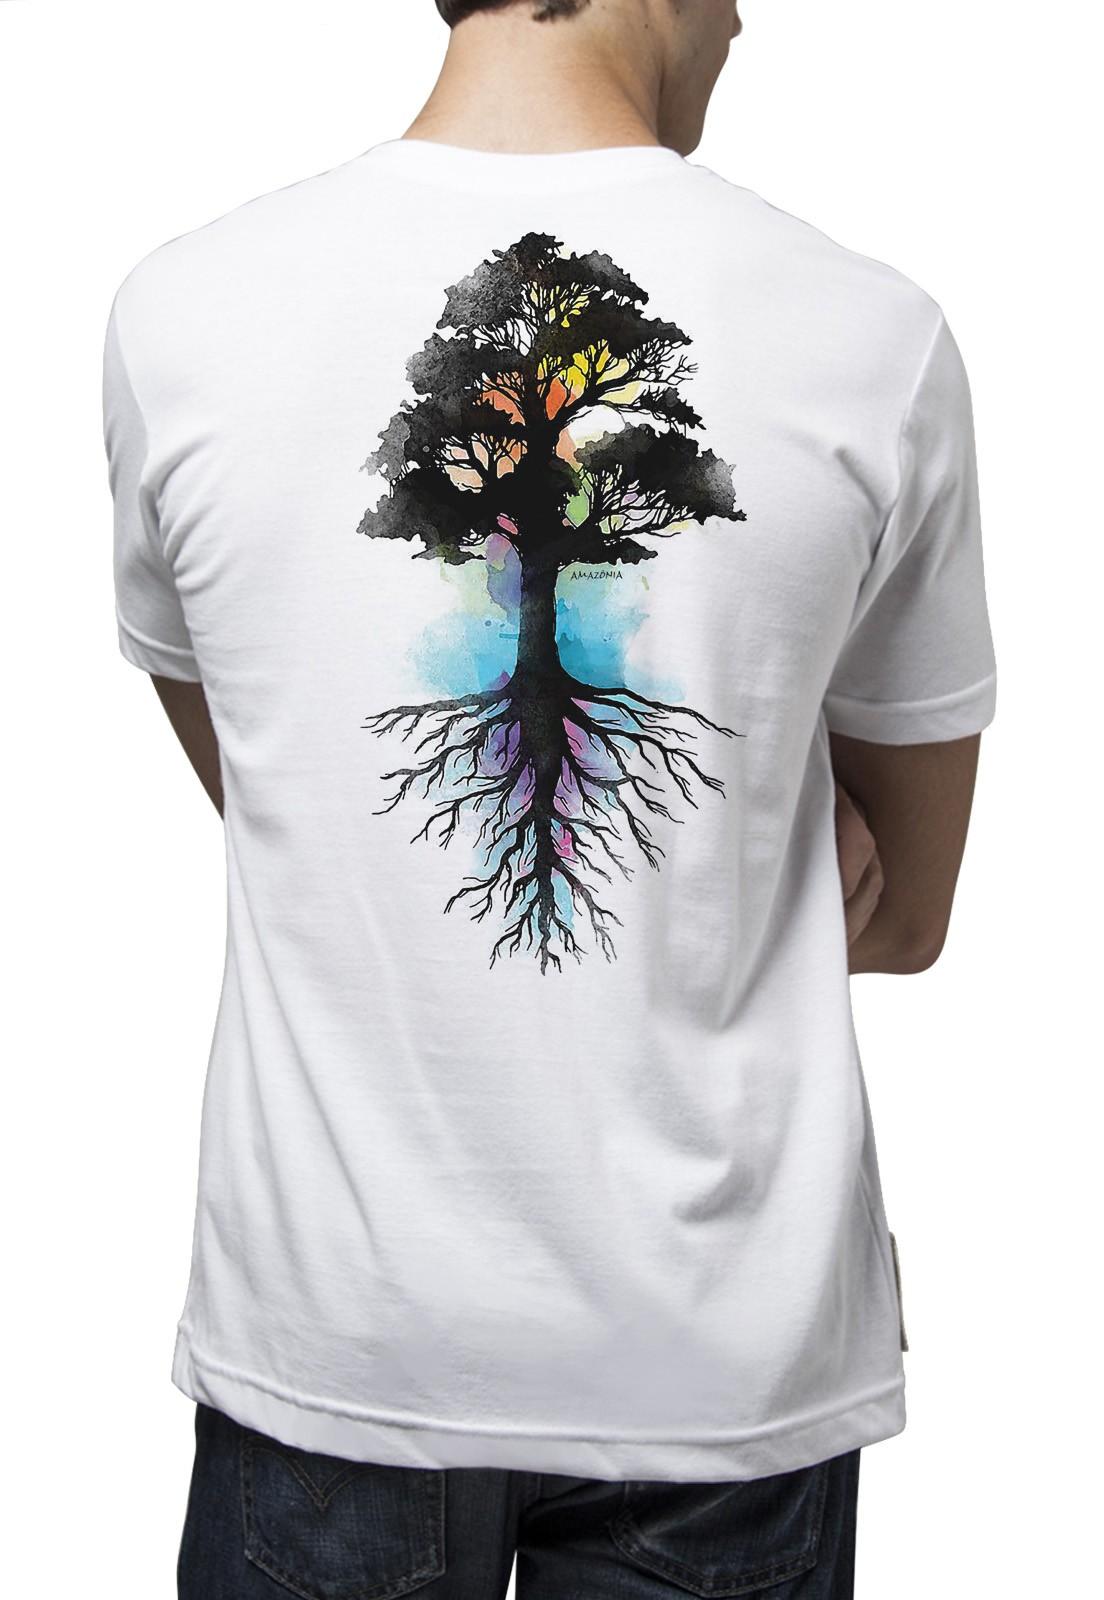 Camiseta Amazônia Força Natural - Branco